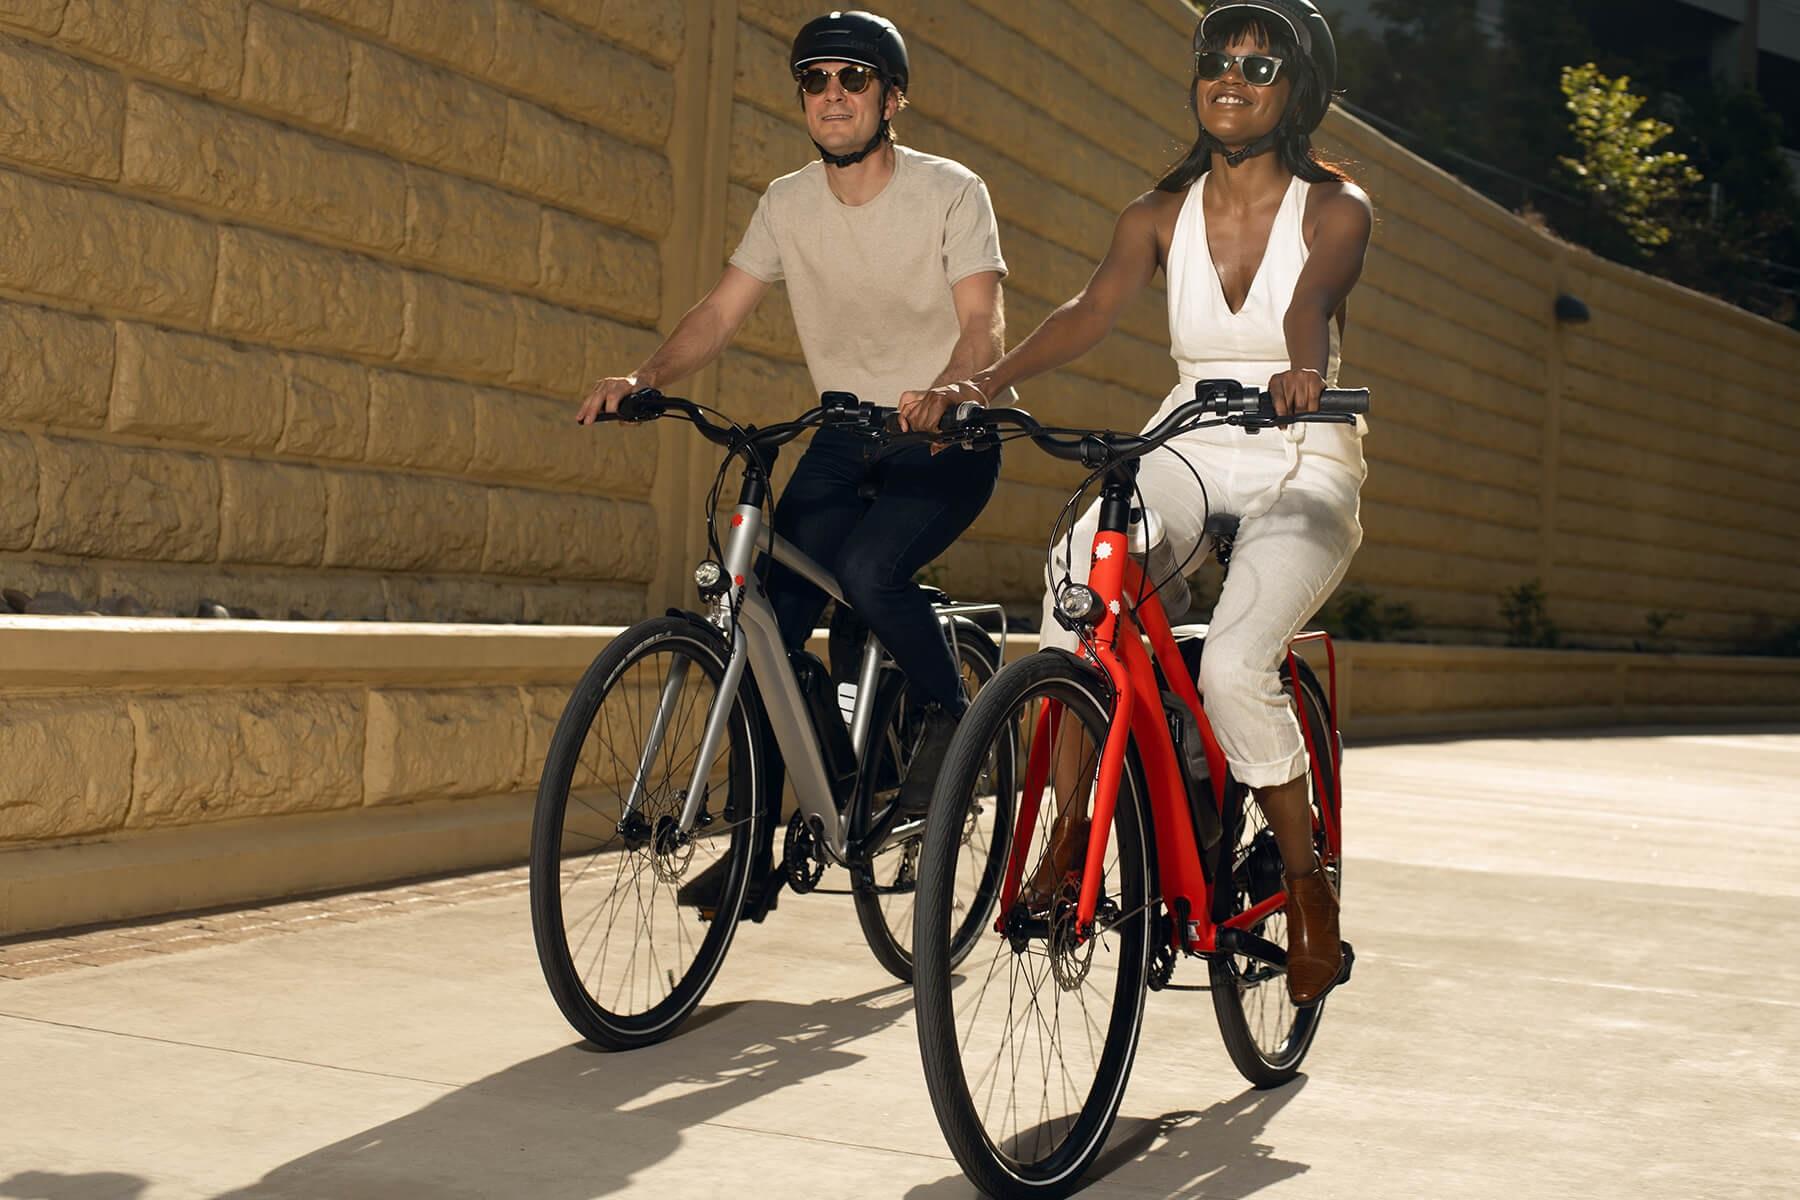 Charge City e-bike's conclusion